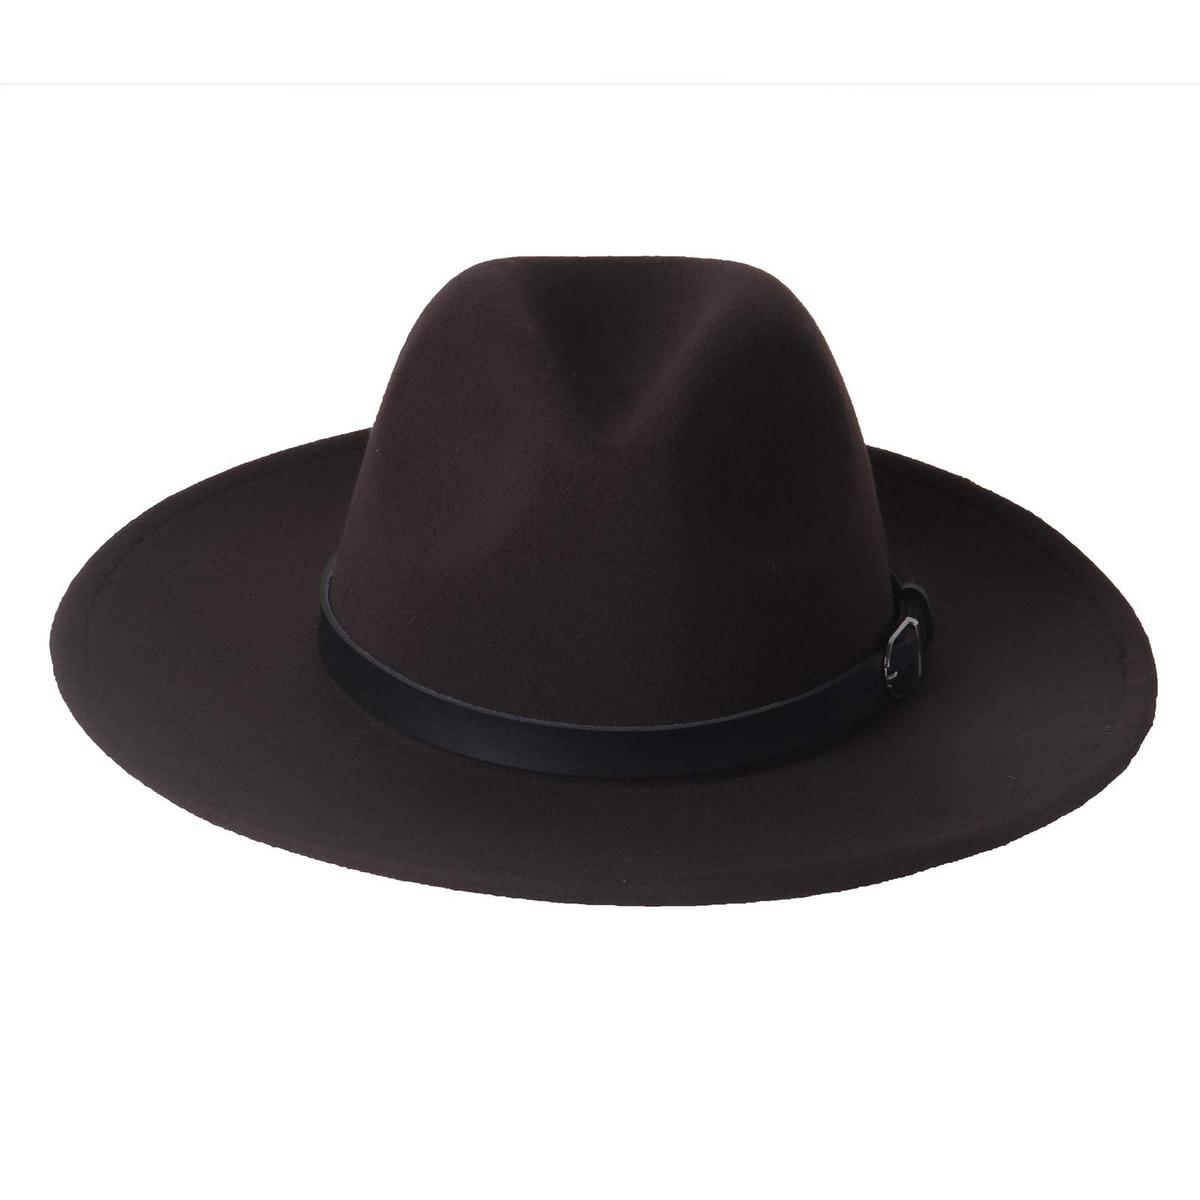 1aa1e1836f5 dantiya women s wide brim wool fedora panama hat con belt... Cargando zoom.